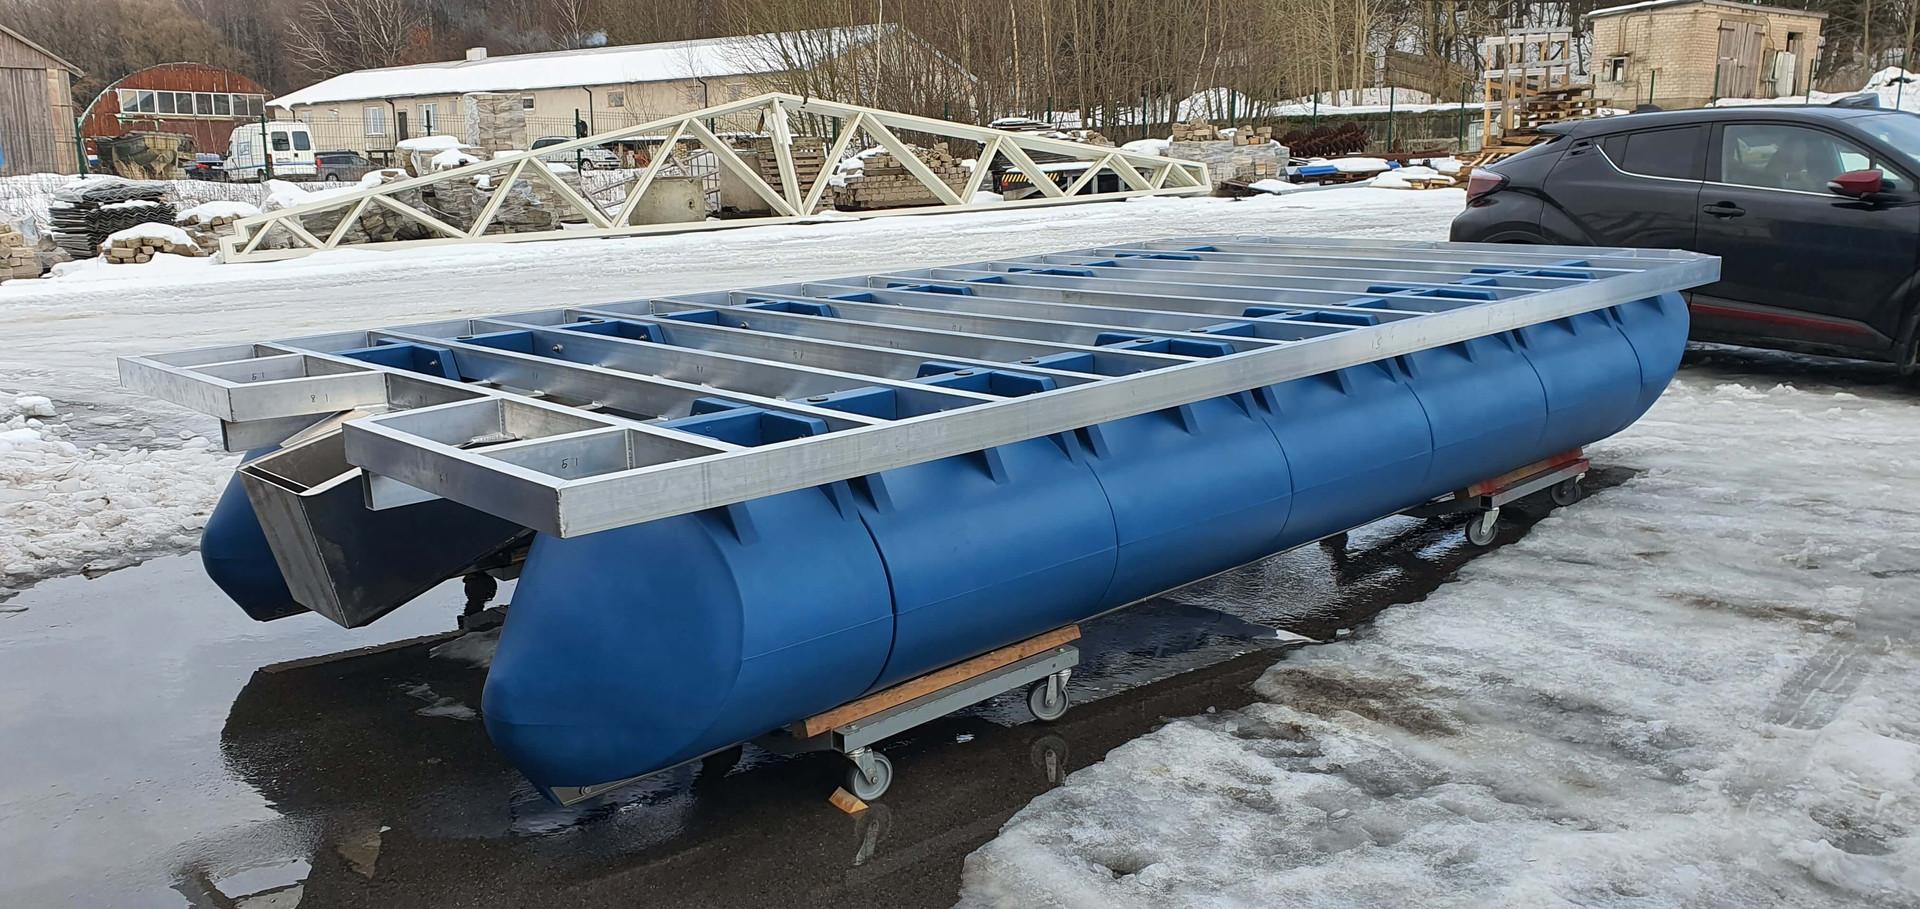 5,8m x 3m catamaran with blue pontoons